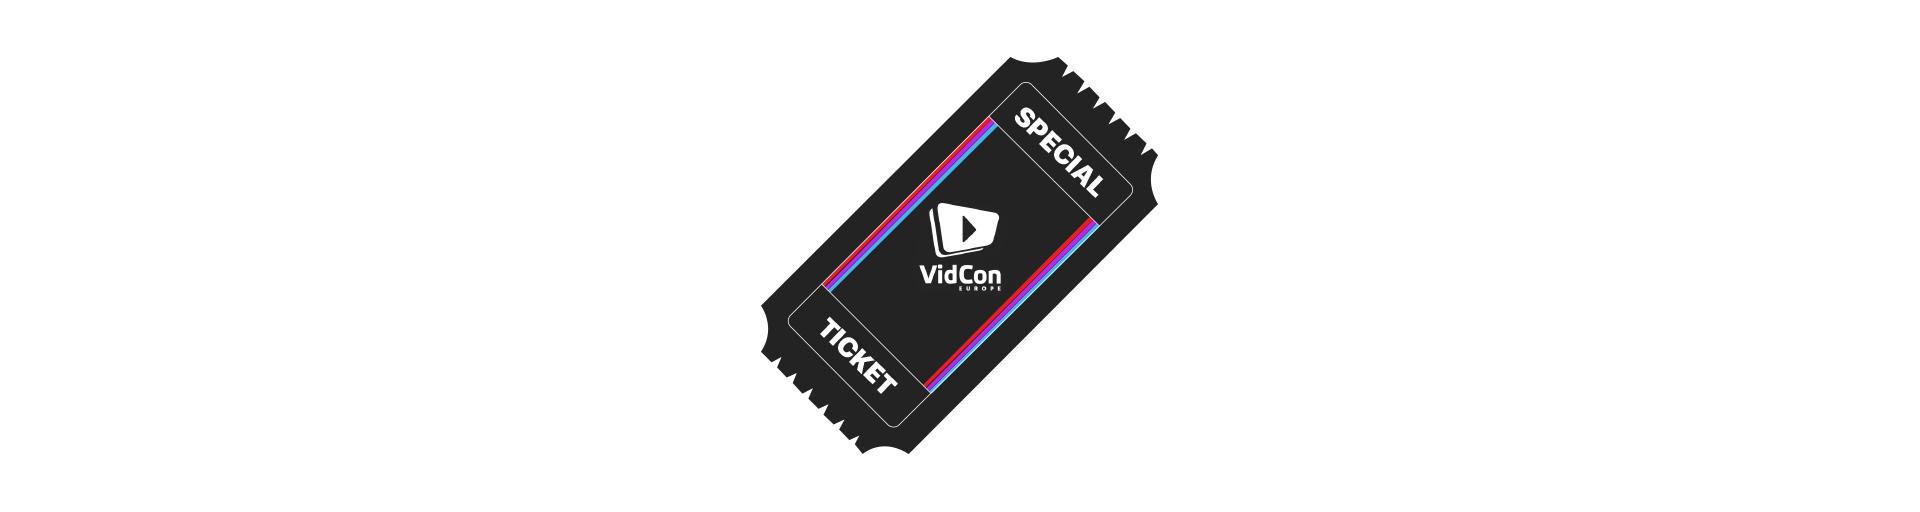 Vidcon-Special.jpg